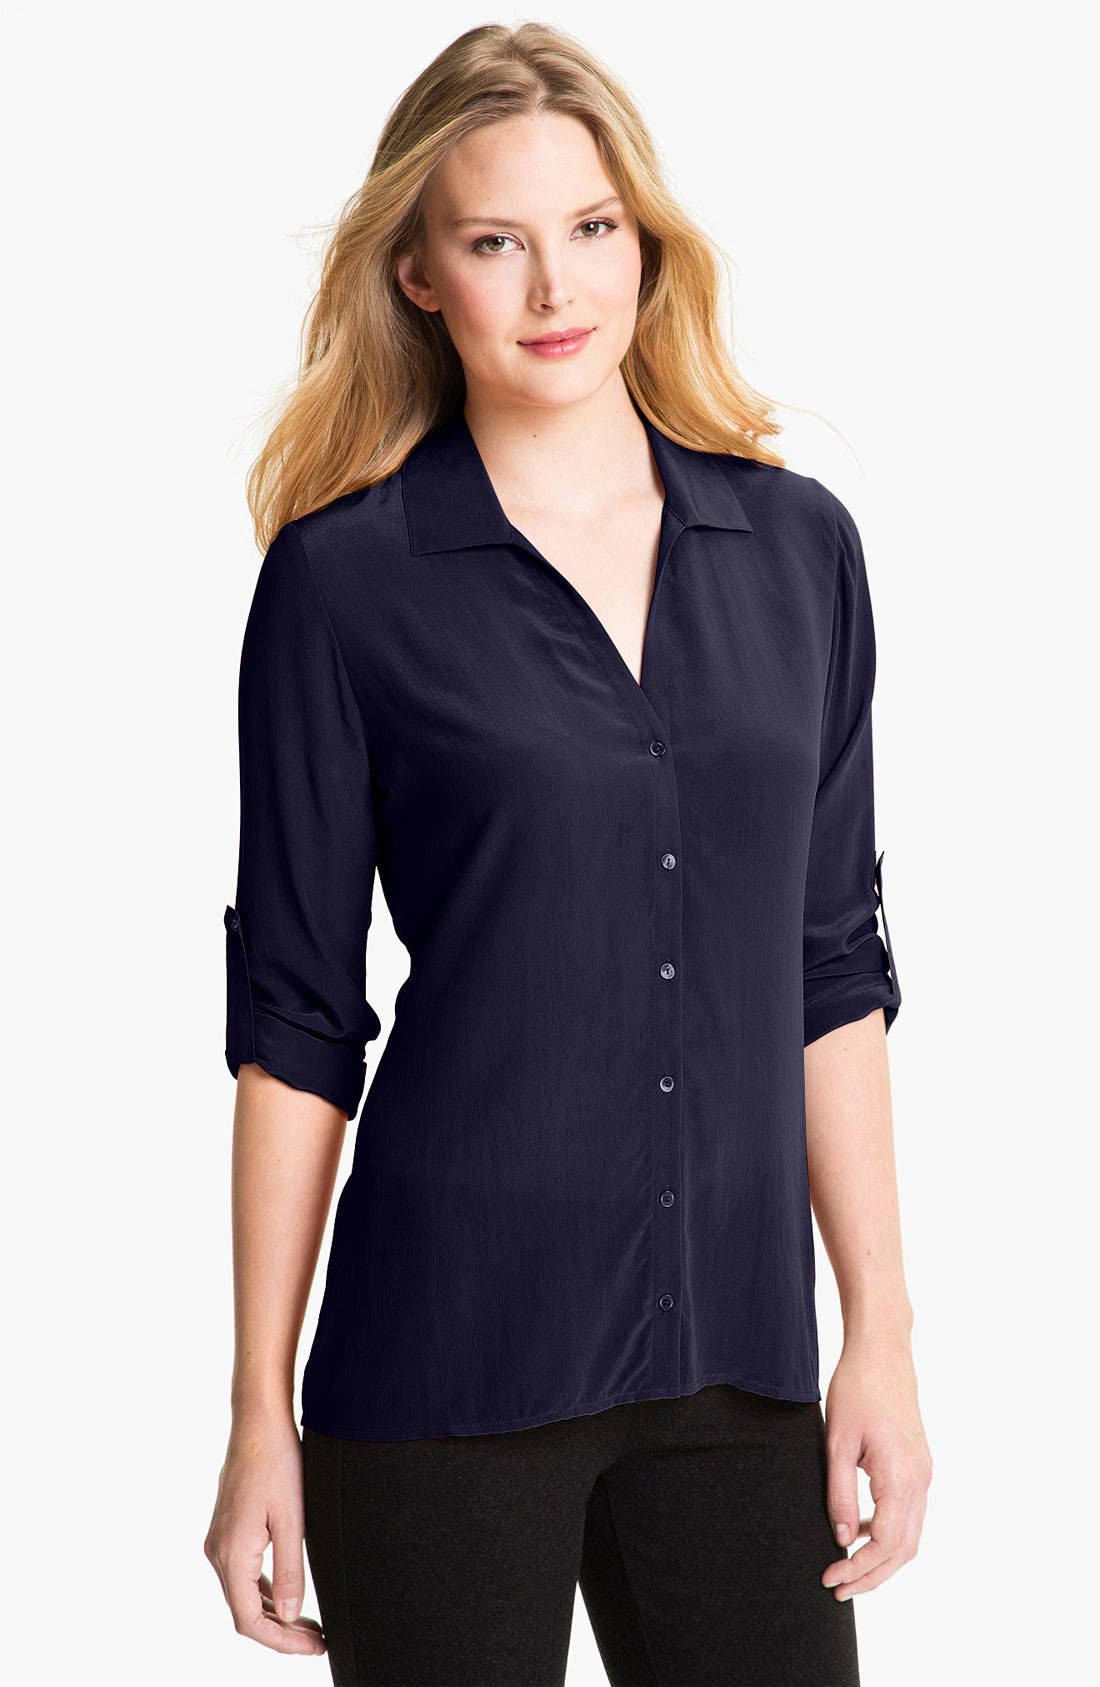 Alternate Image 1 Selected - Eileen Fisher Crêpe de Chine Silk Shirt (Online Exclusive)